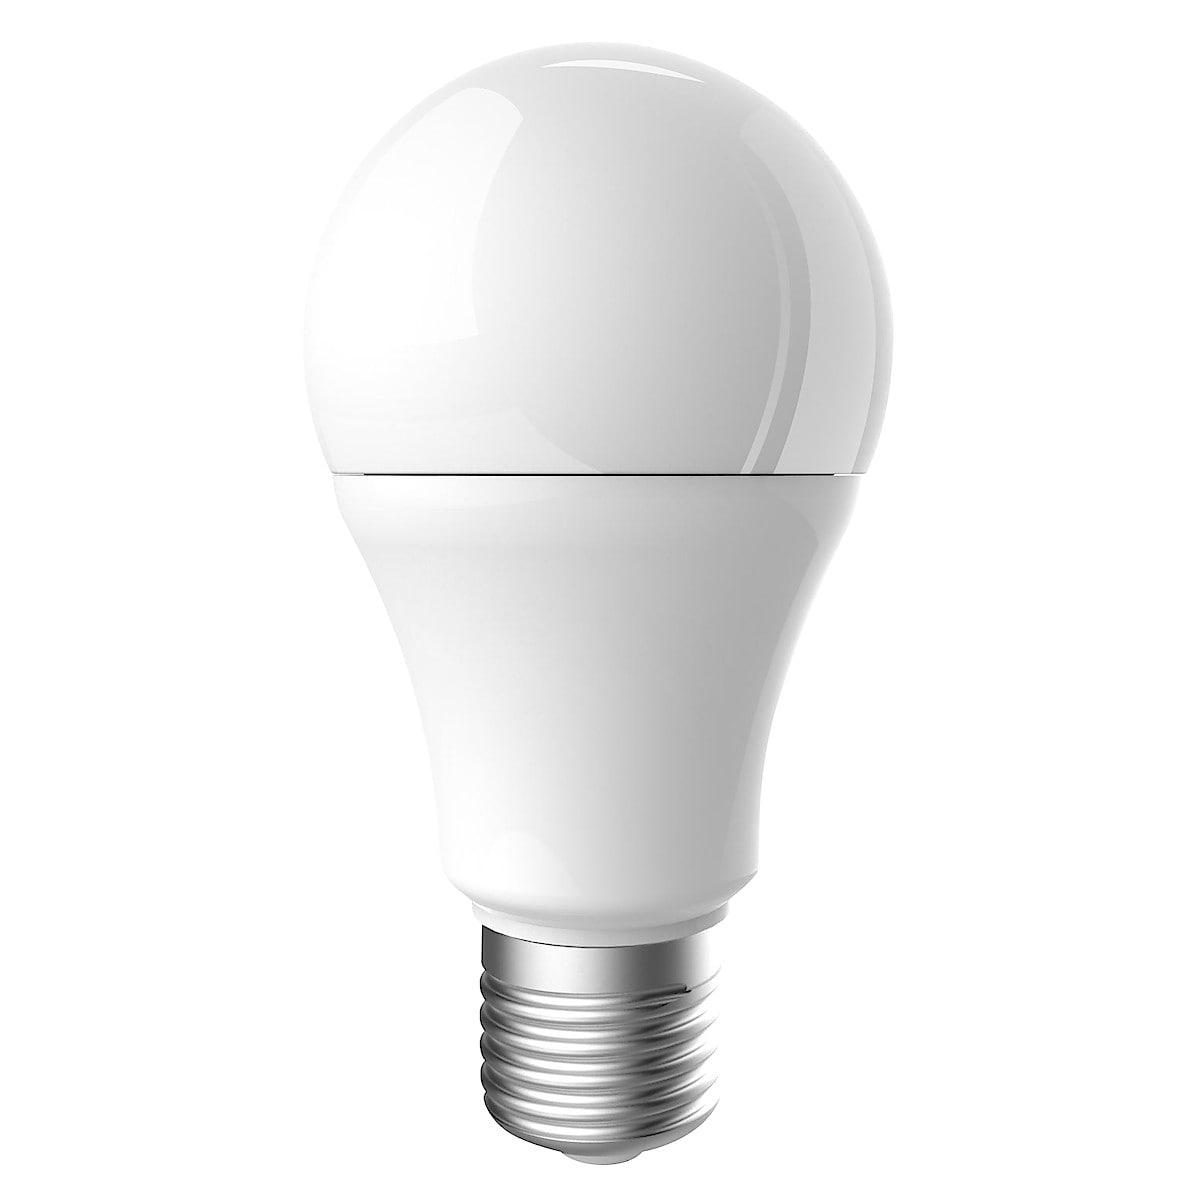 WiFi Smart Bulb E27 Clas Ohlson Home